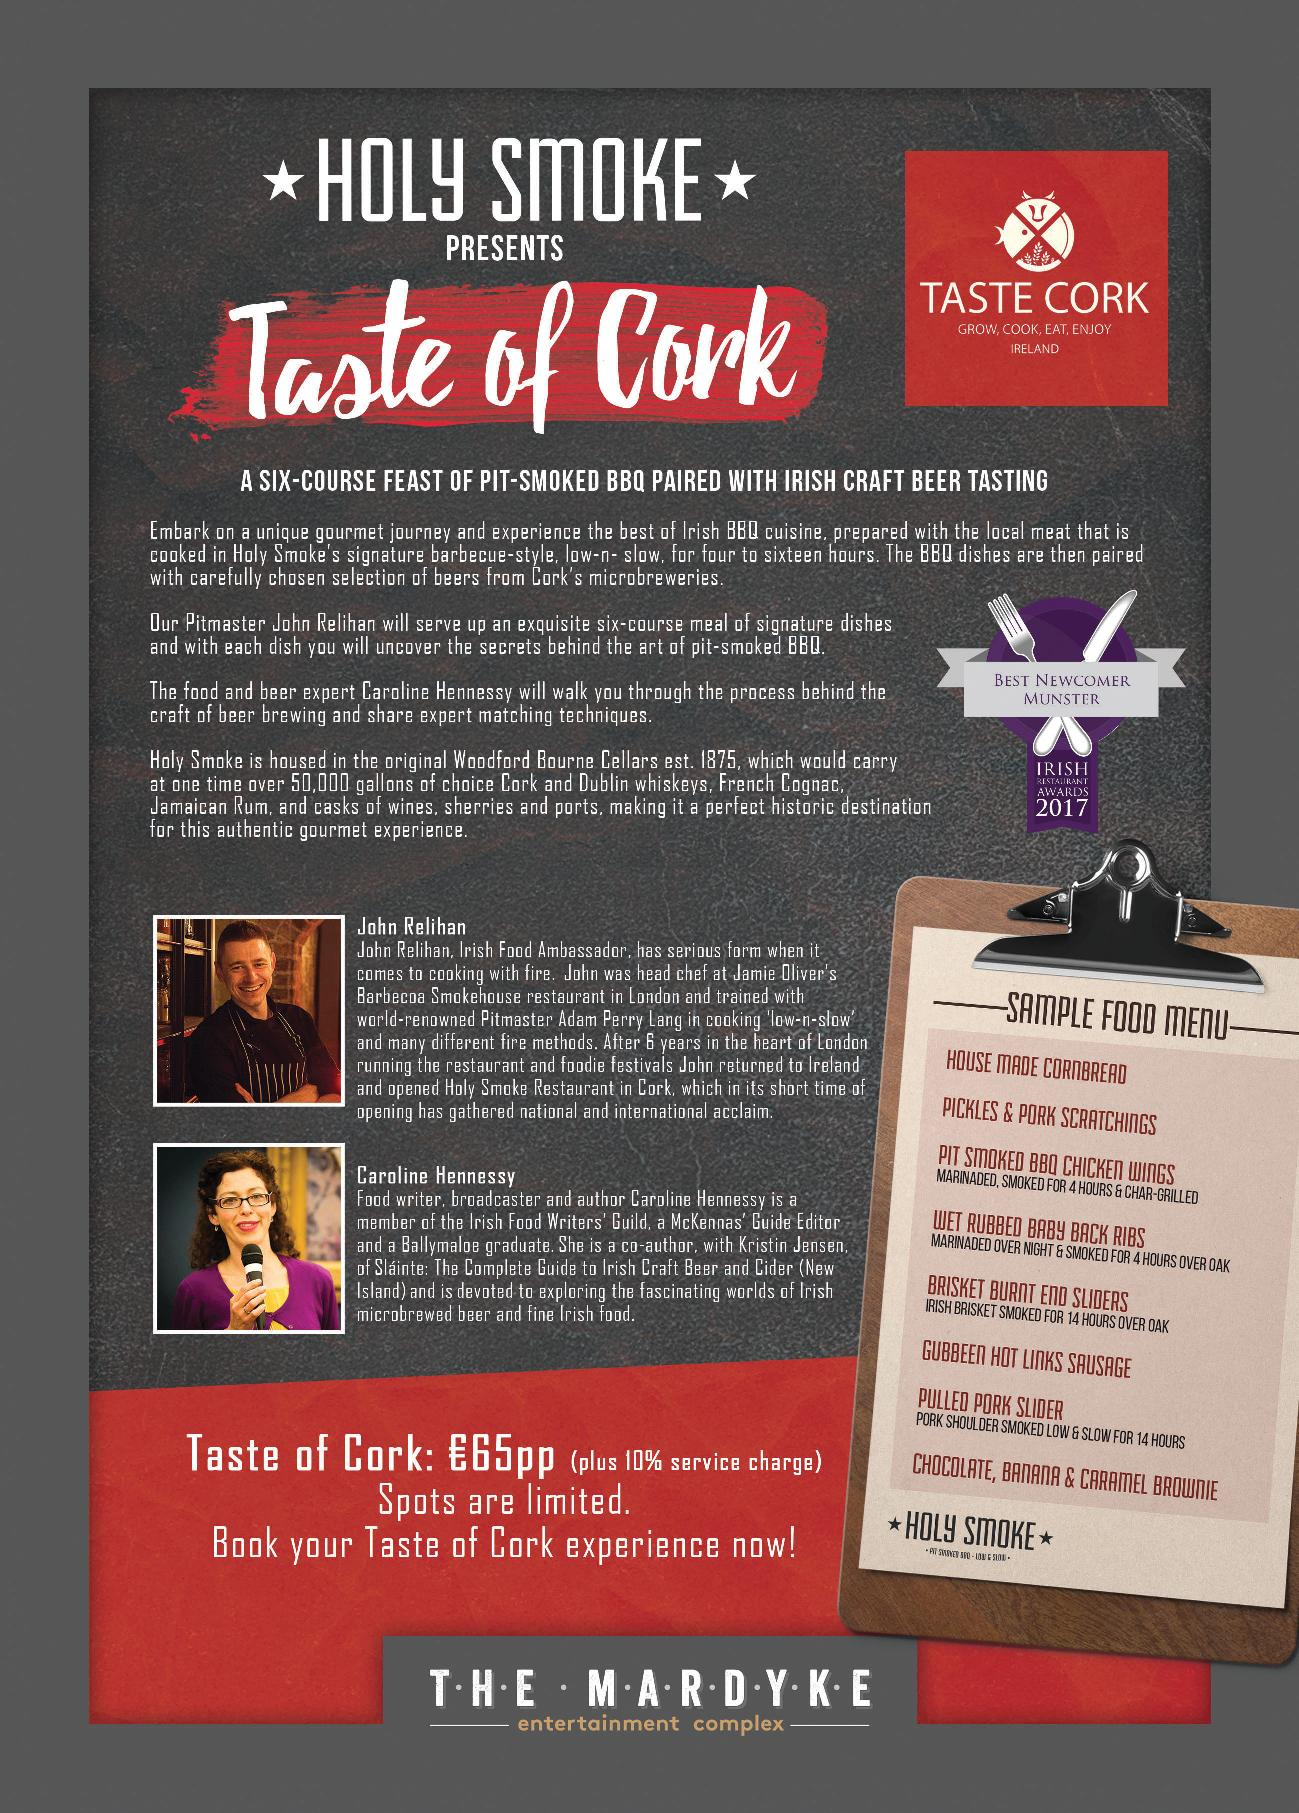 Taste of Cork Holy Smoke BBQ